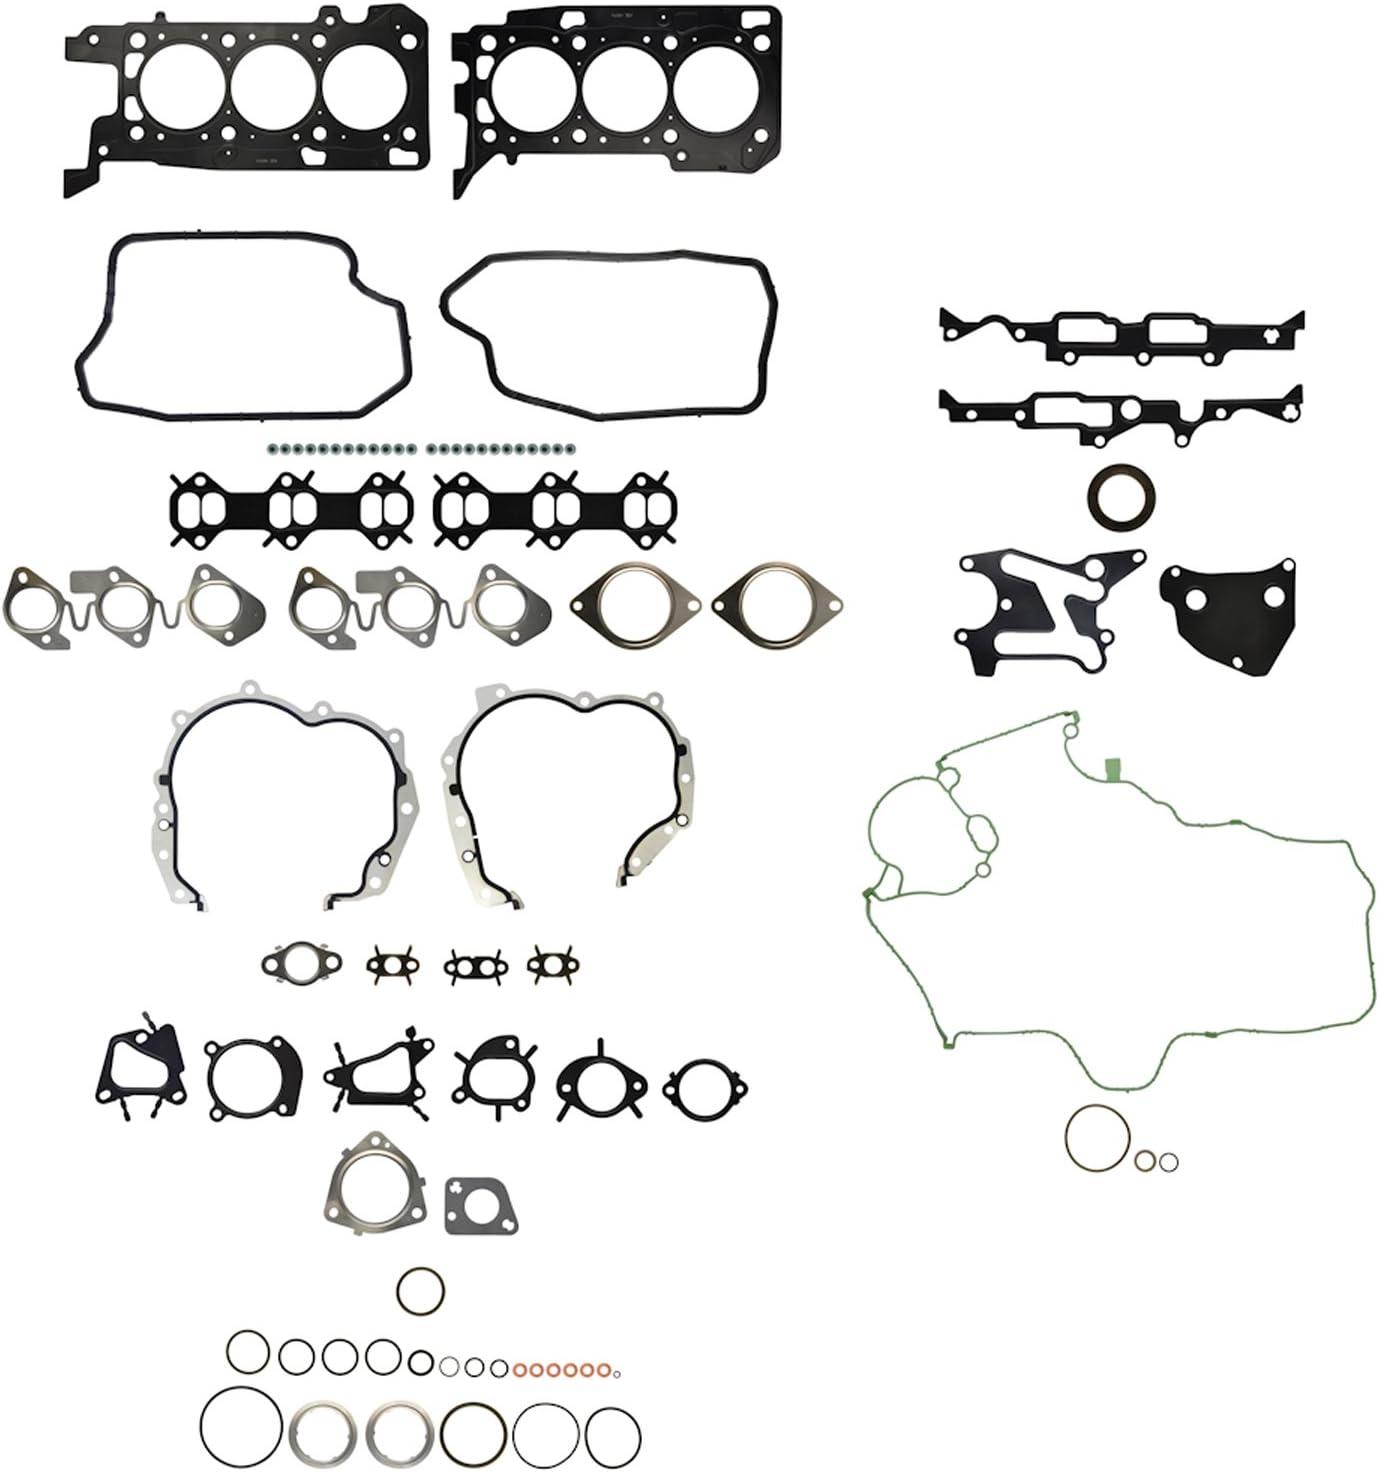 Ajusa 50328400 Full Gasket Set engine